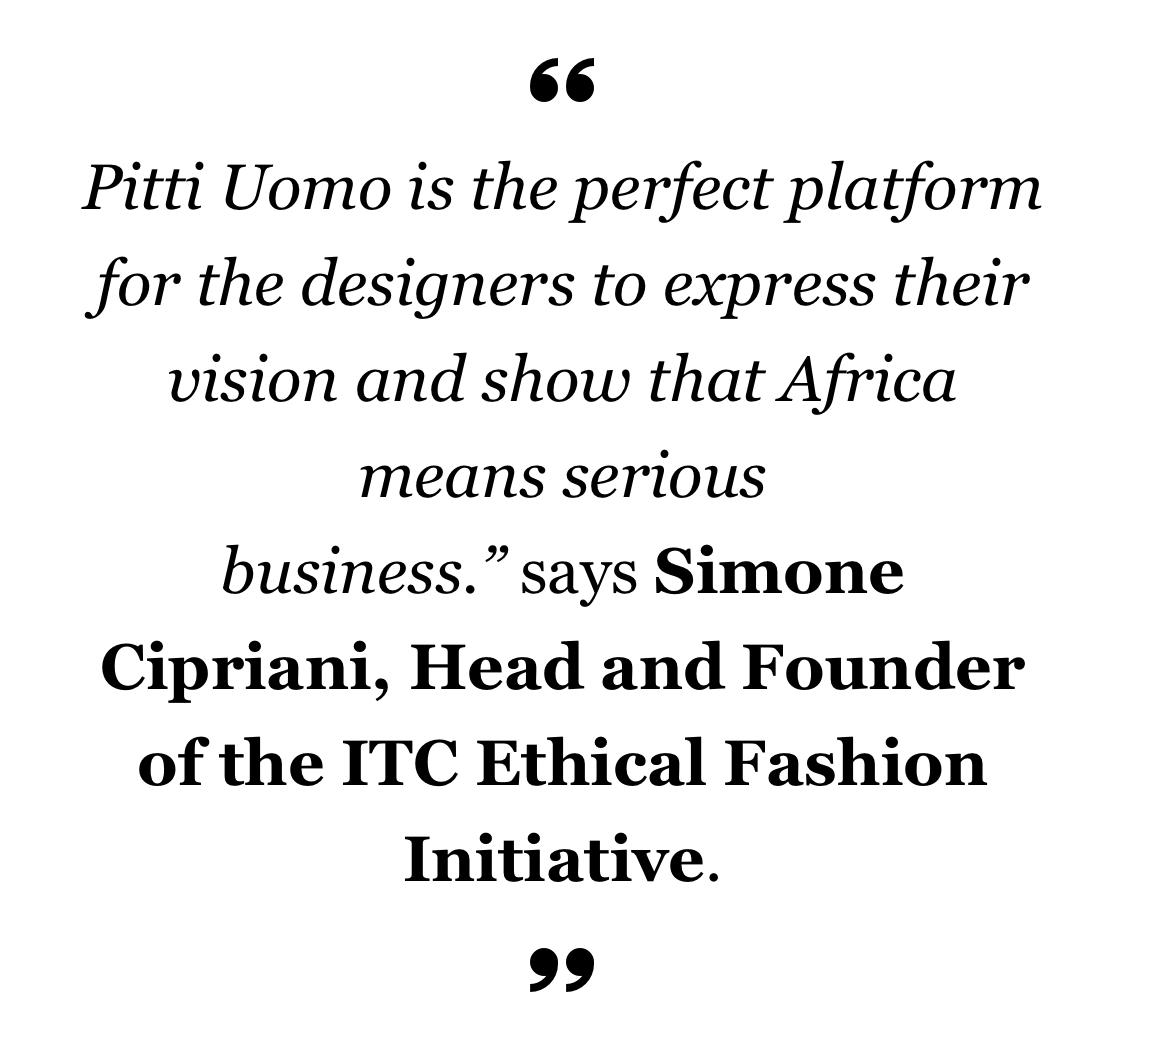 Generation Africa Designers selected by Ethical Fashion Initiative for Pitti Uomo 89, ITC Ethical Fashion Initiative AKJP, Ikire Jones, Lukhanyo Mdingi x Nicholas Coutts & Ur